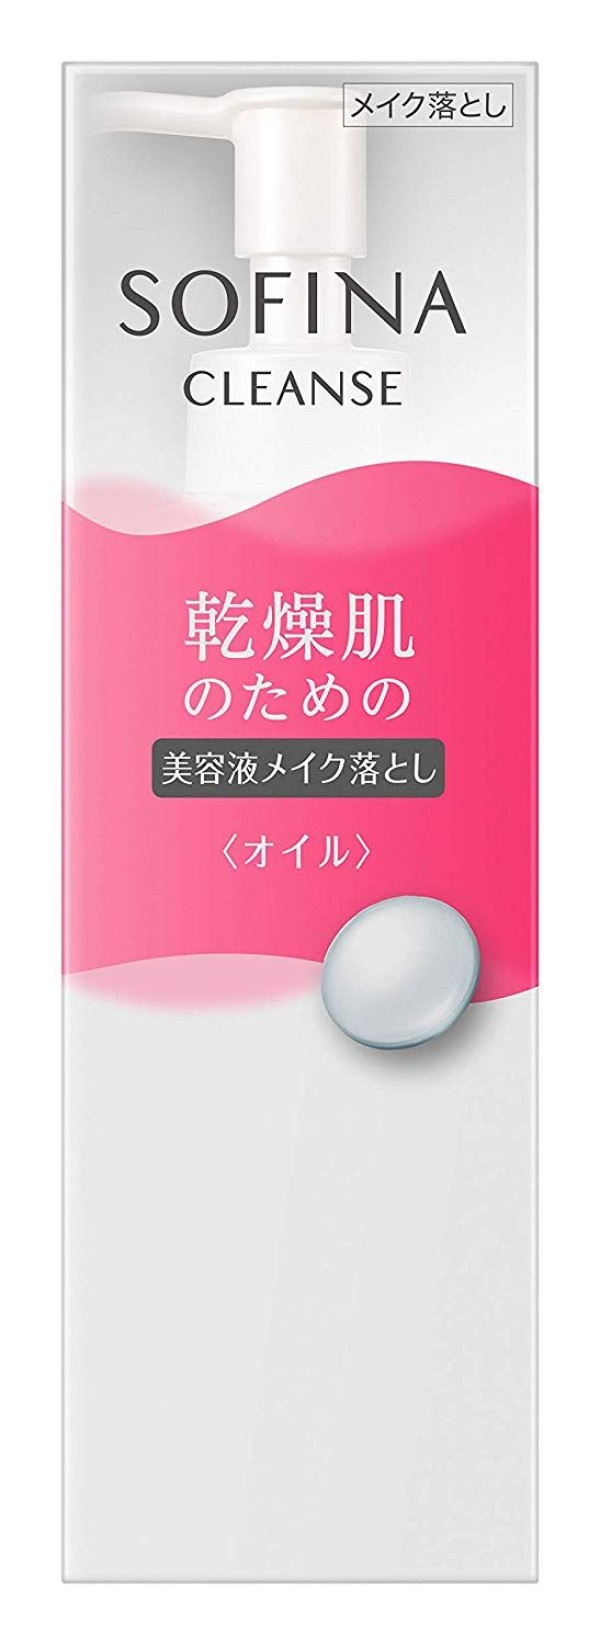 Масло для снятия макияжа Sofina Cleanse Oil Make-up Remover